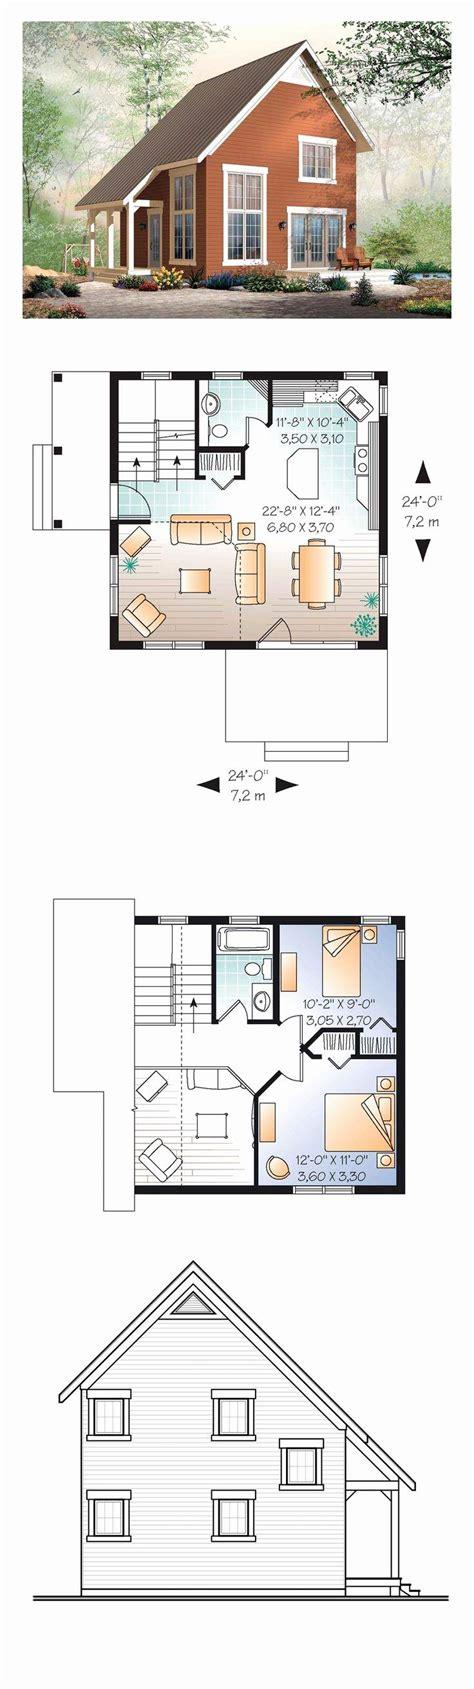 15 luxury mediterranean home plans narrow lot home plan